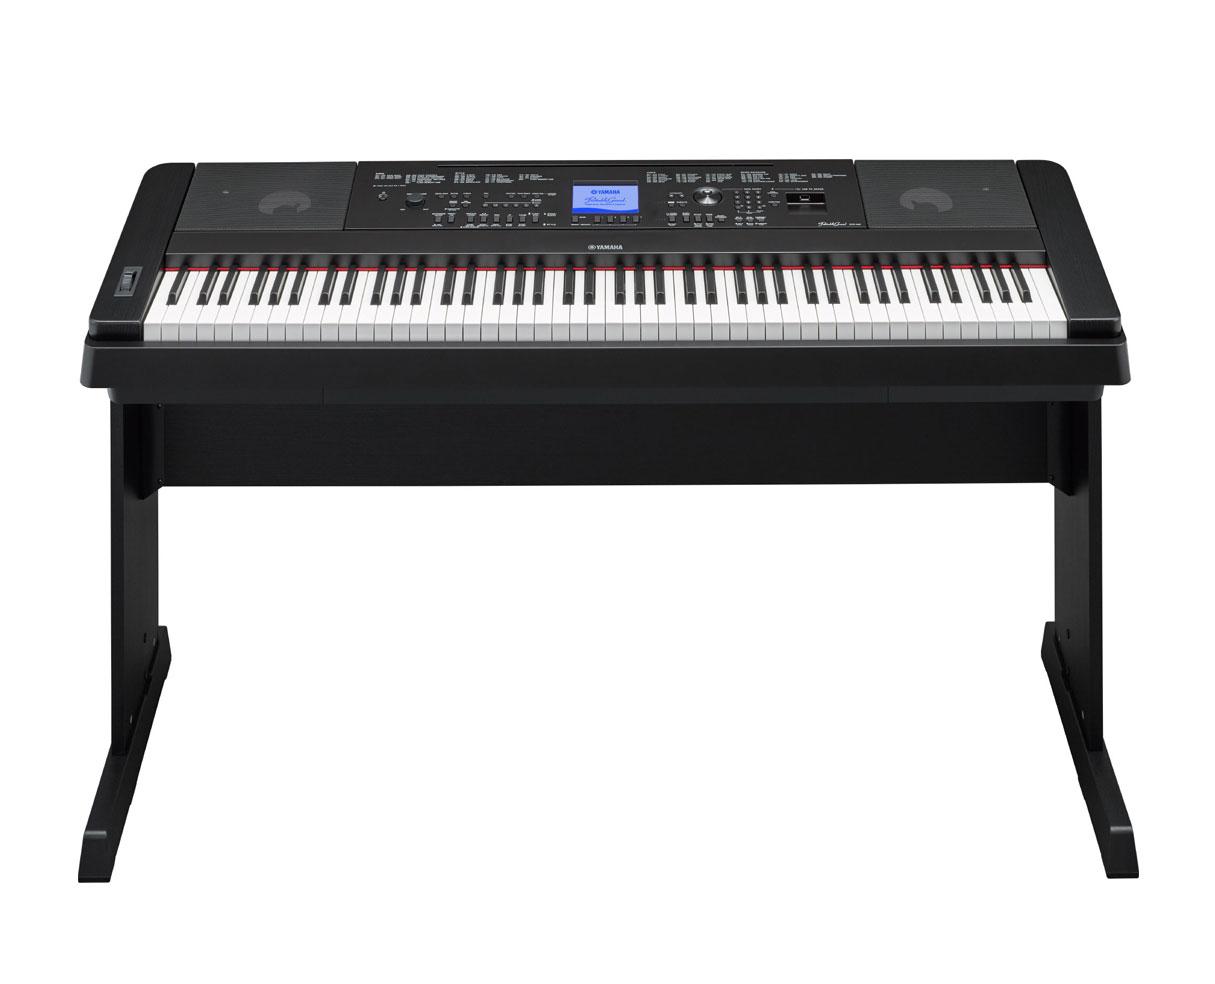 yamaha dgx660b dgx 660 88 key ensemble digital piano w stand proaudiostar. Black Bedroom Furniture Sets. Home Design Ideas